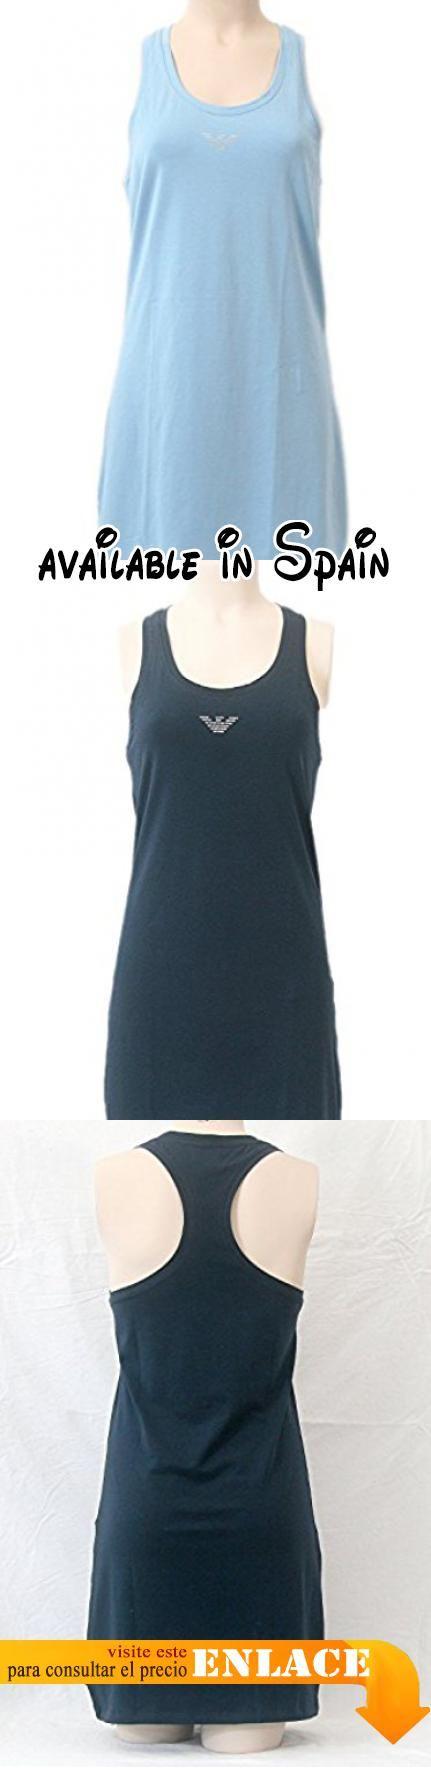 B072PSTCD7 : Emporio Armani - Camisón - para mujer Dusk Blue (13931) Small. #Ropa #SLEEPWEAR